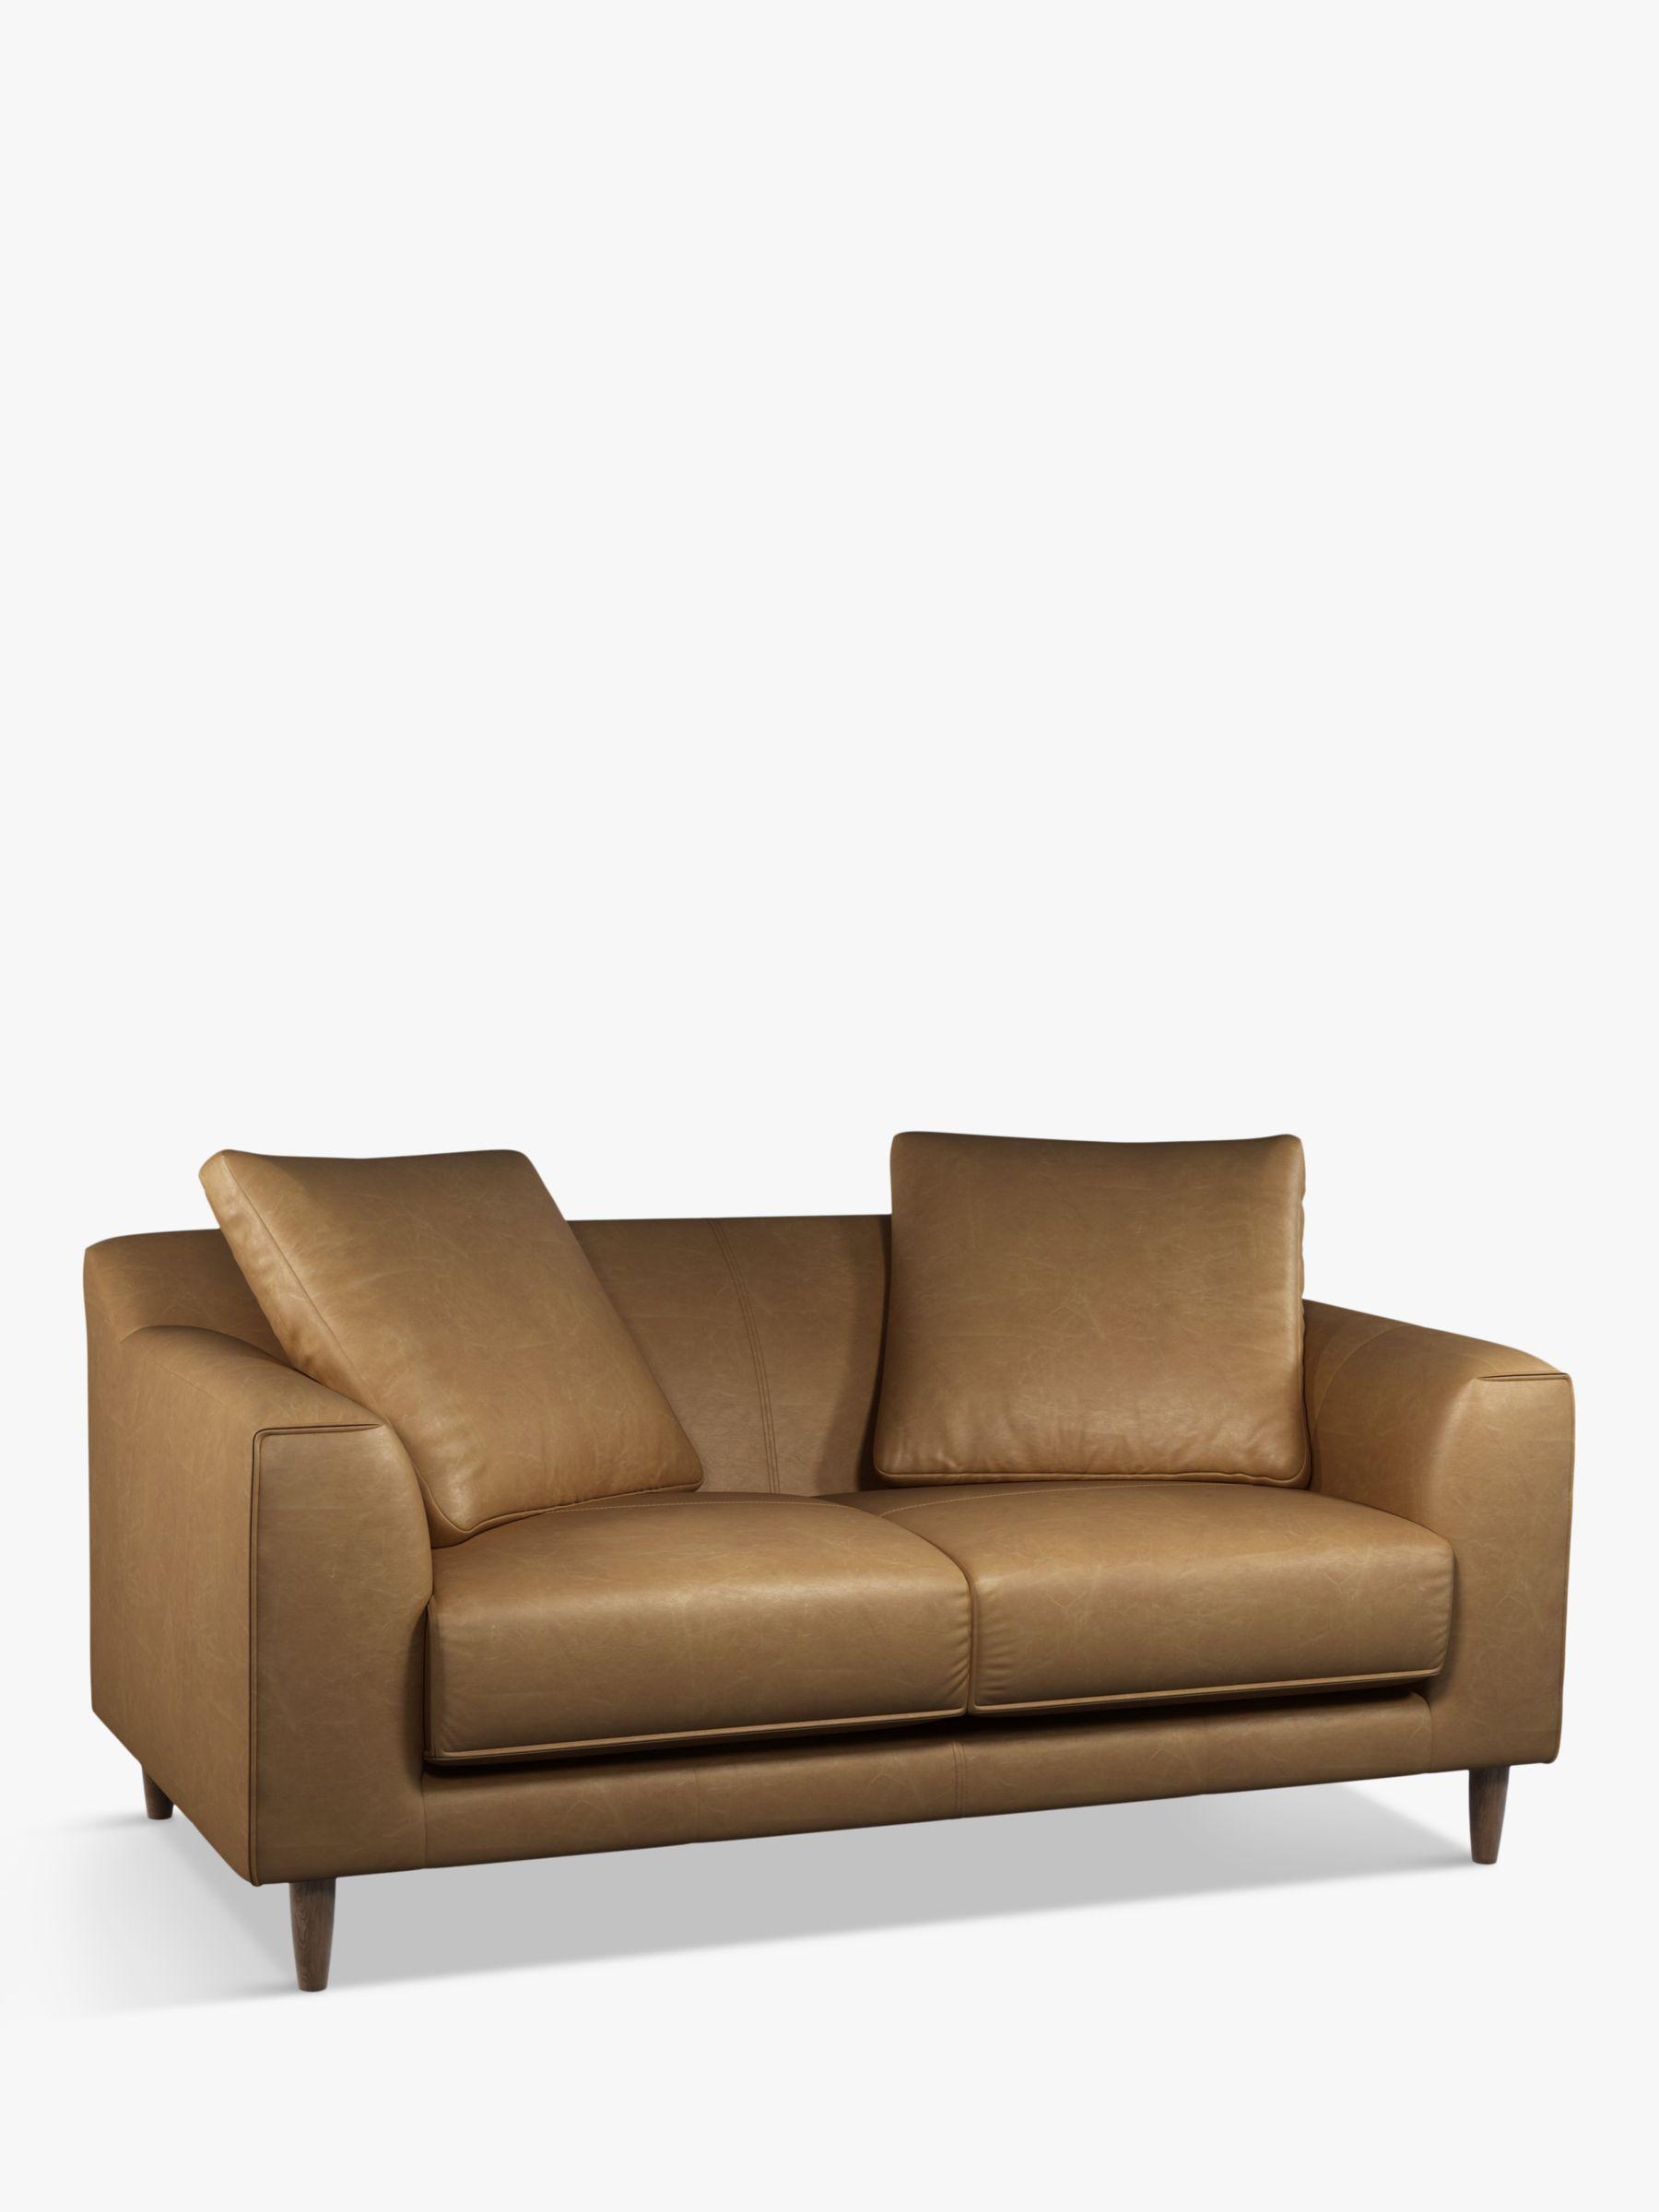 John Lewis Partners Billow Medium 2 Seater Leather Sofa